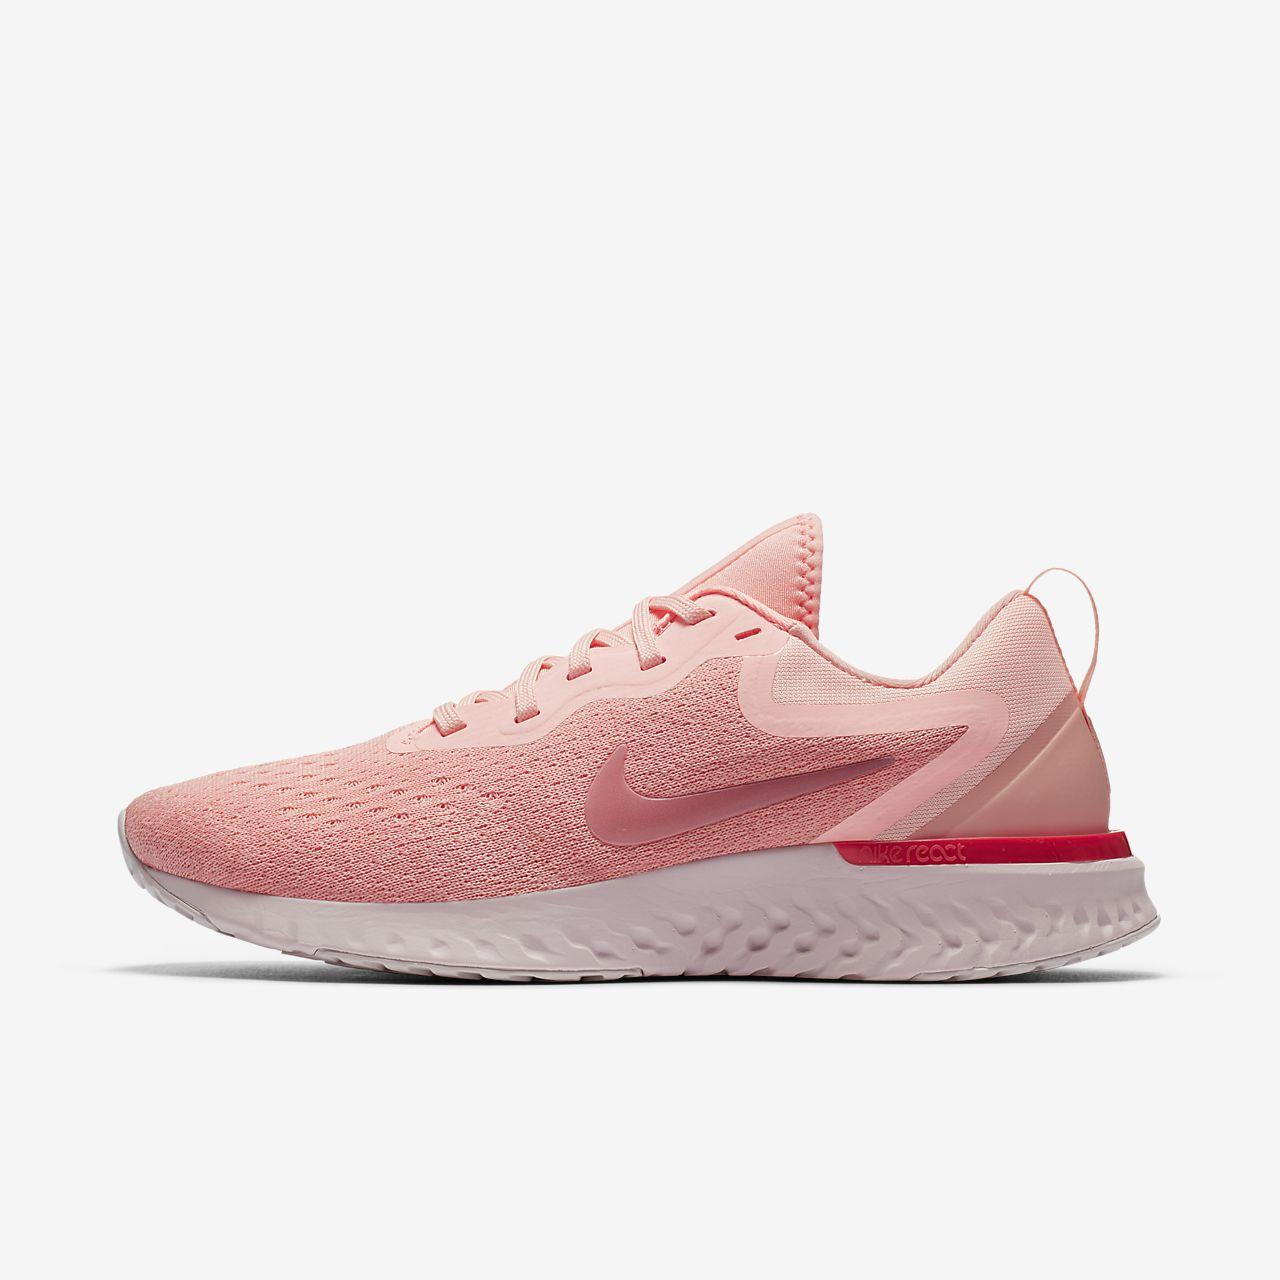 Sapatilhas de running Nike Odyssey React para mulher